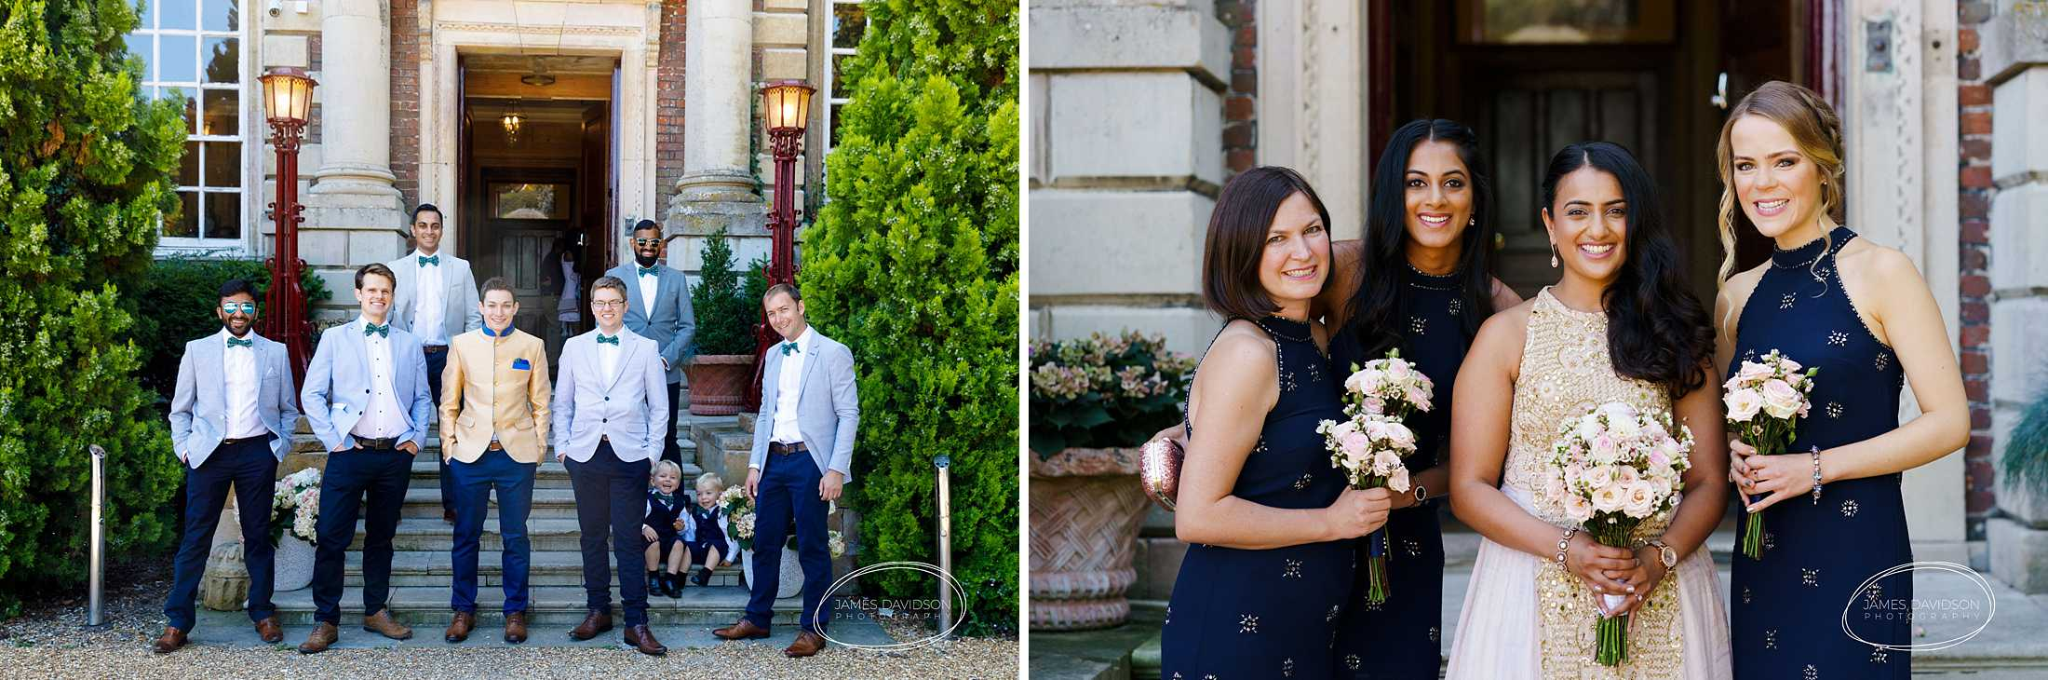 anstey-hall-wedding-019